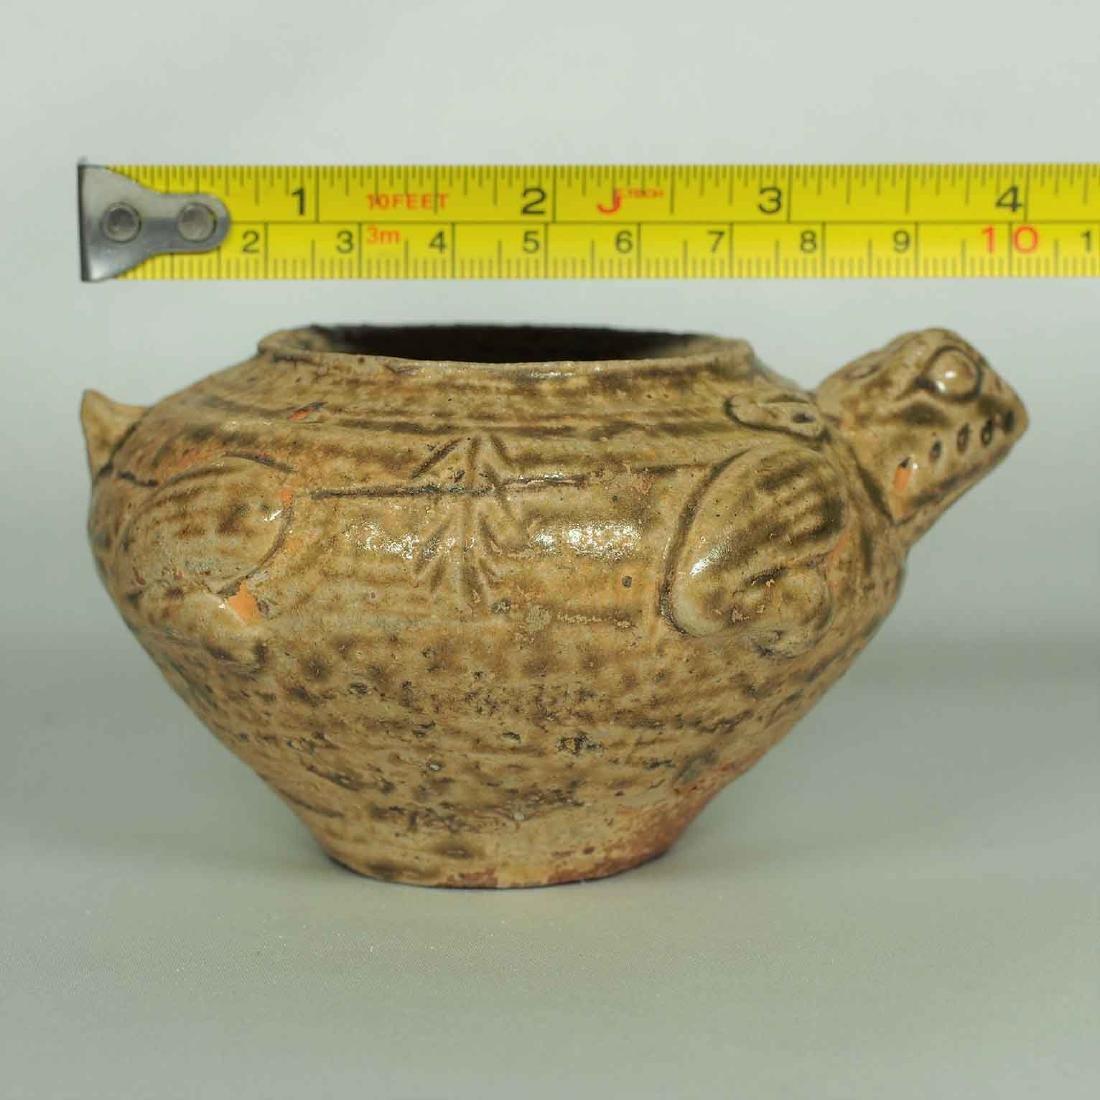 Proto-Porcelain Turtle-Form Water Pot, Han Dynasty - 11